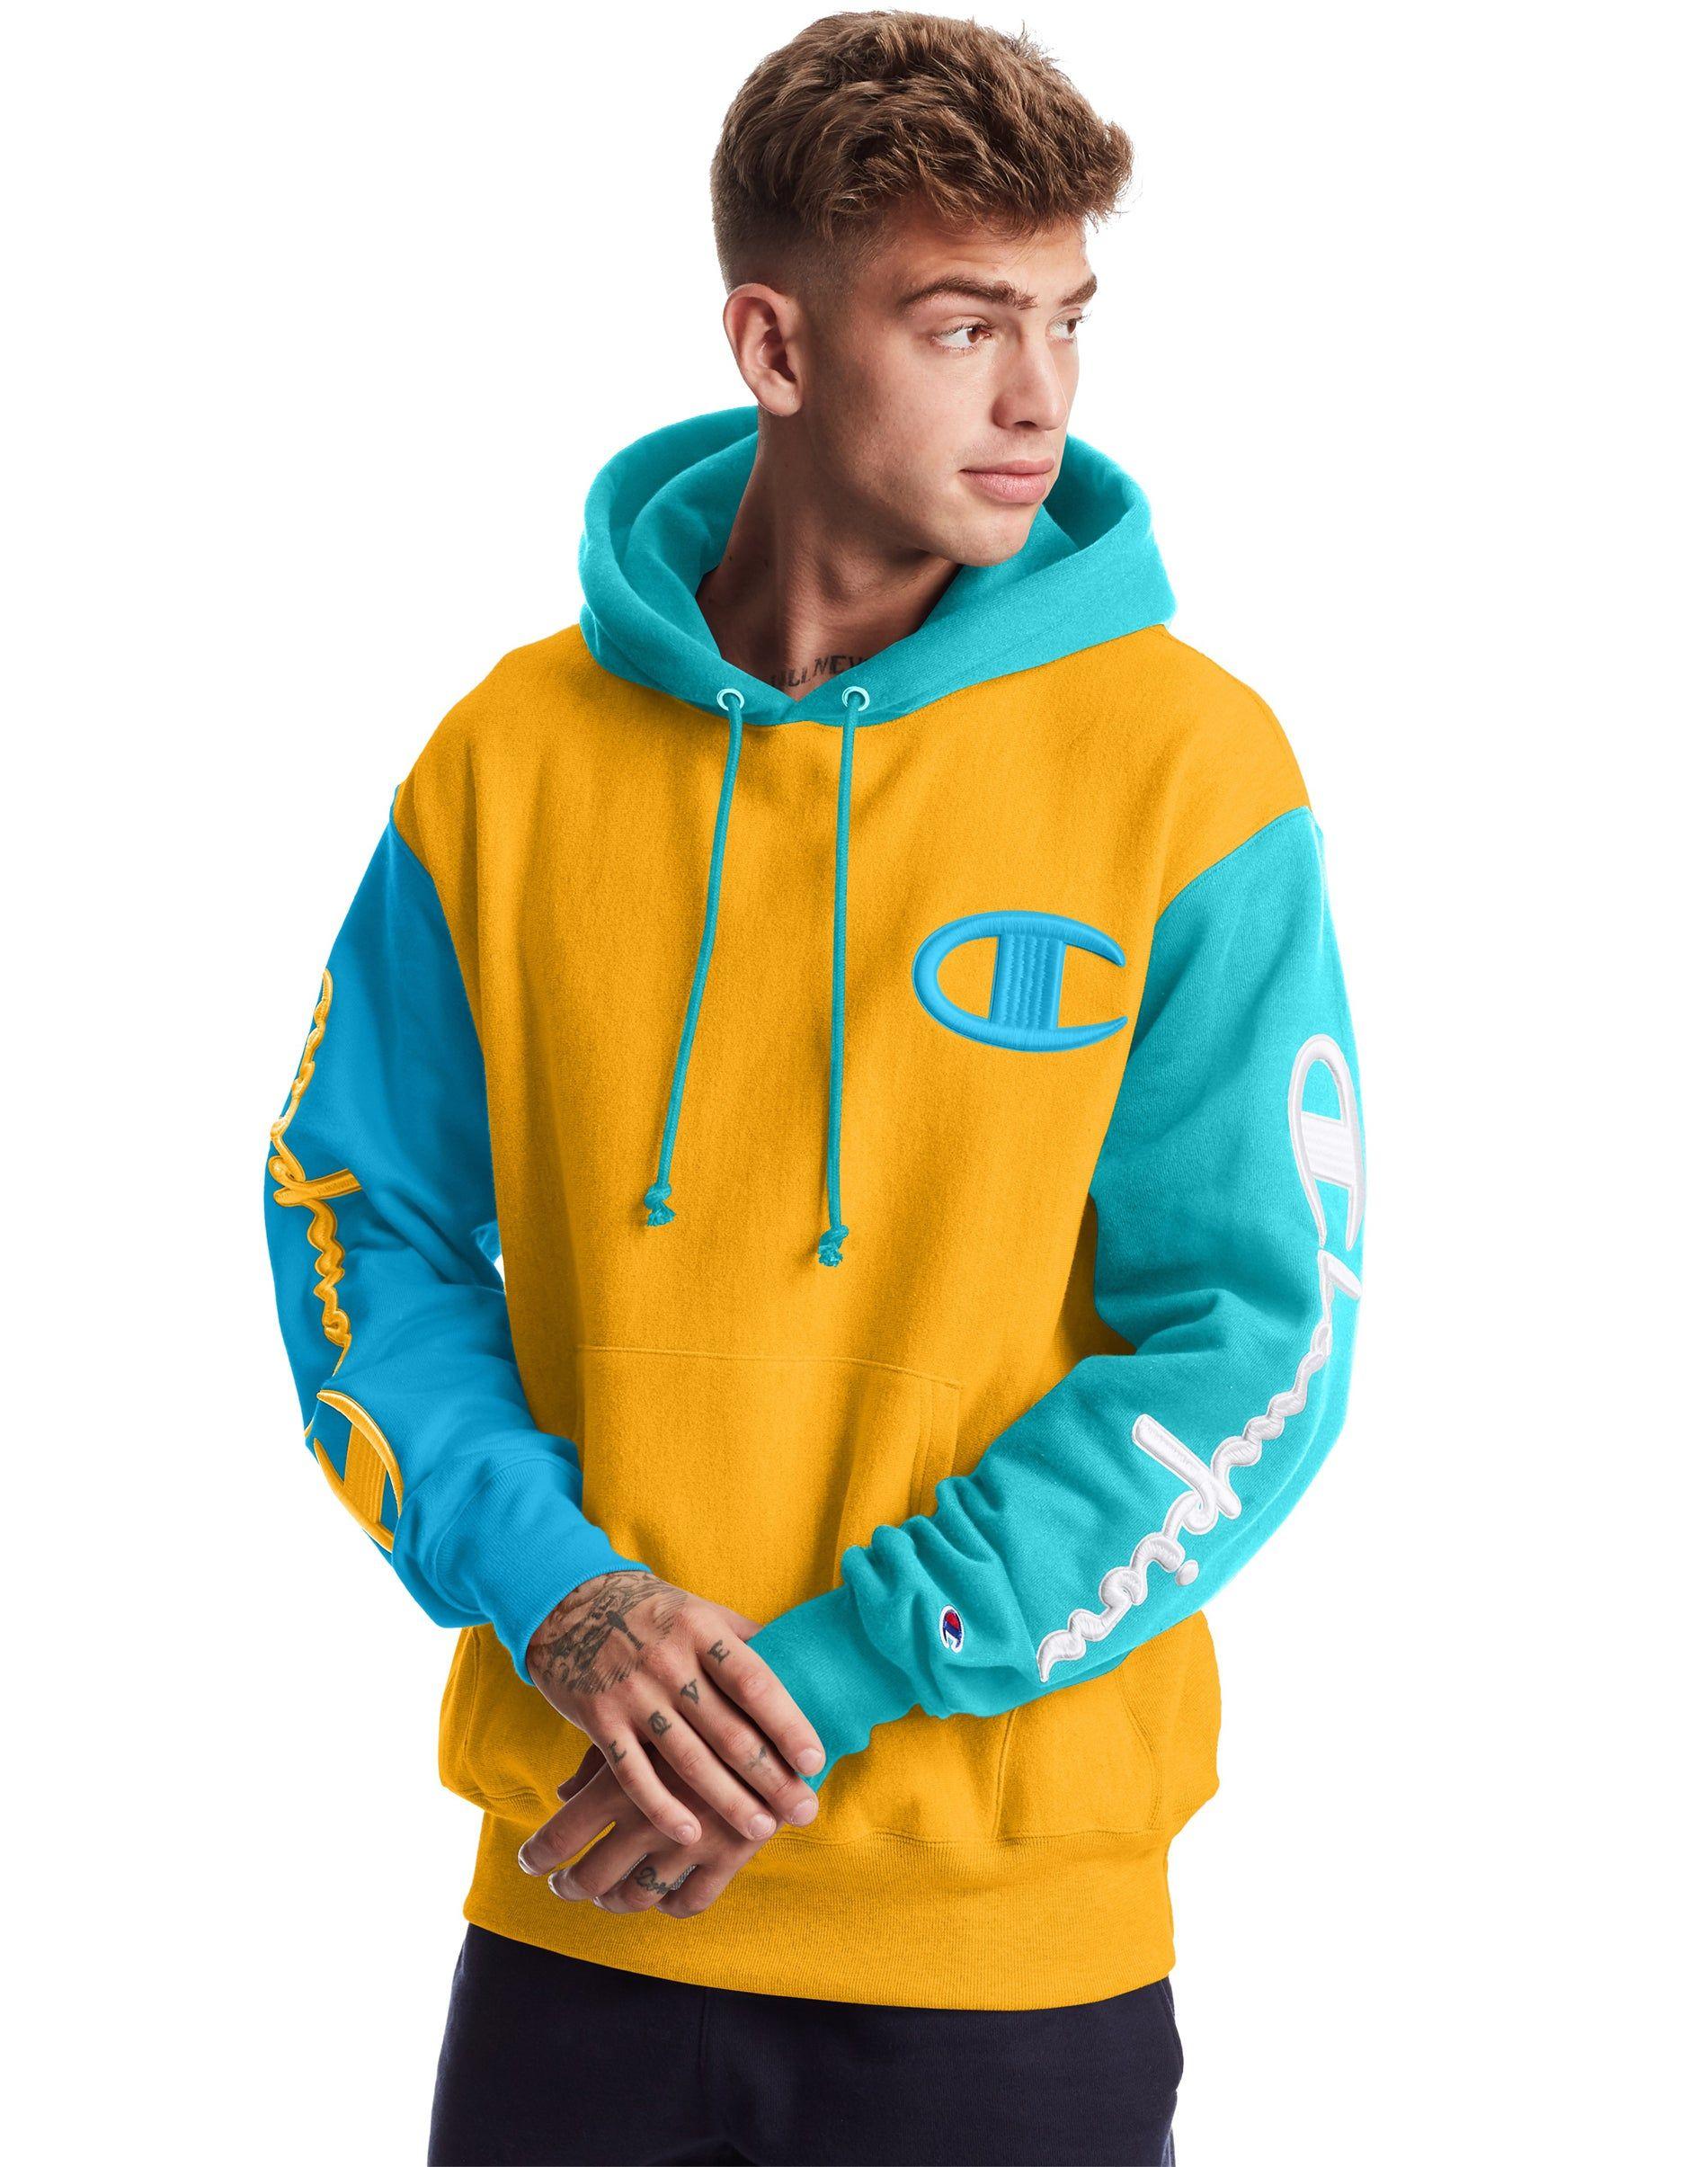 Men S Champion Life Reverse Weave Colorblock Hoodie Citrus Blue Horizon Deep Blue Water Trendy Hoodies Hoodies Men Style Stylish Hoodies [ 2410 x 1900 Pixel ]